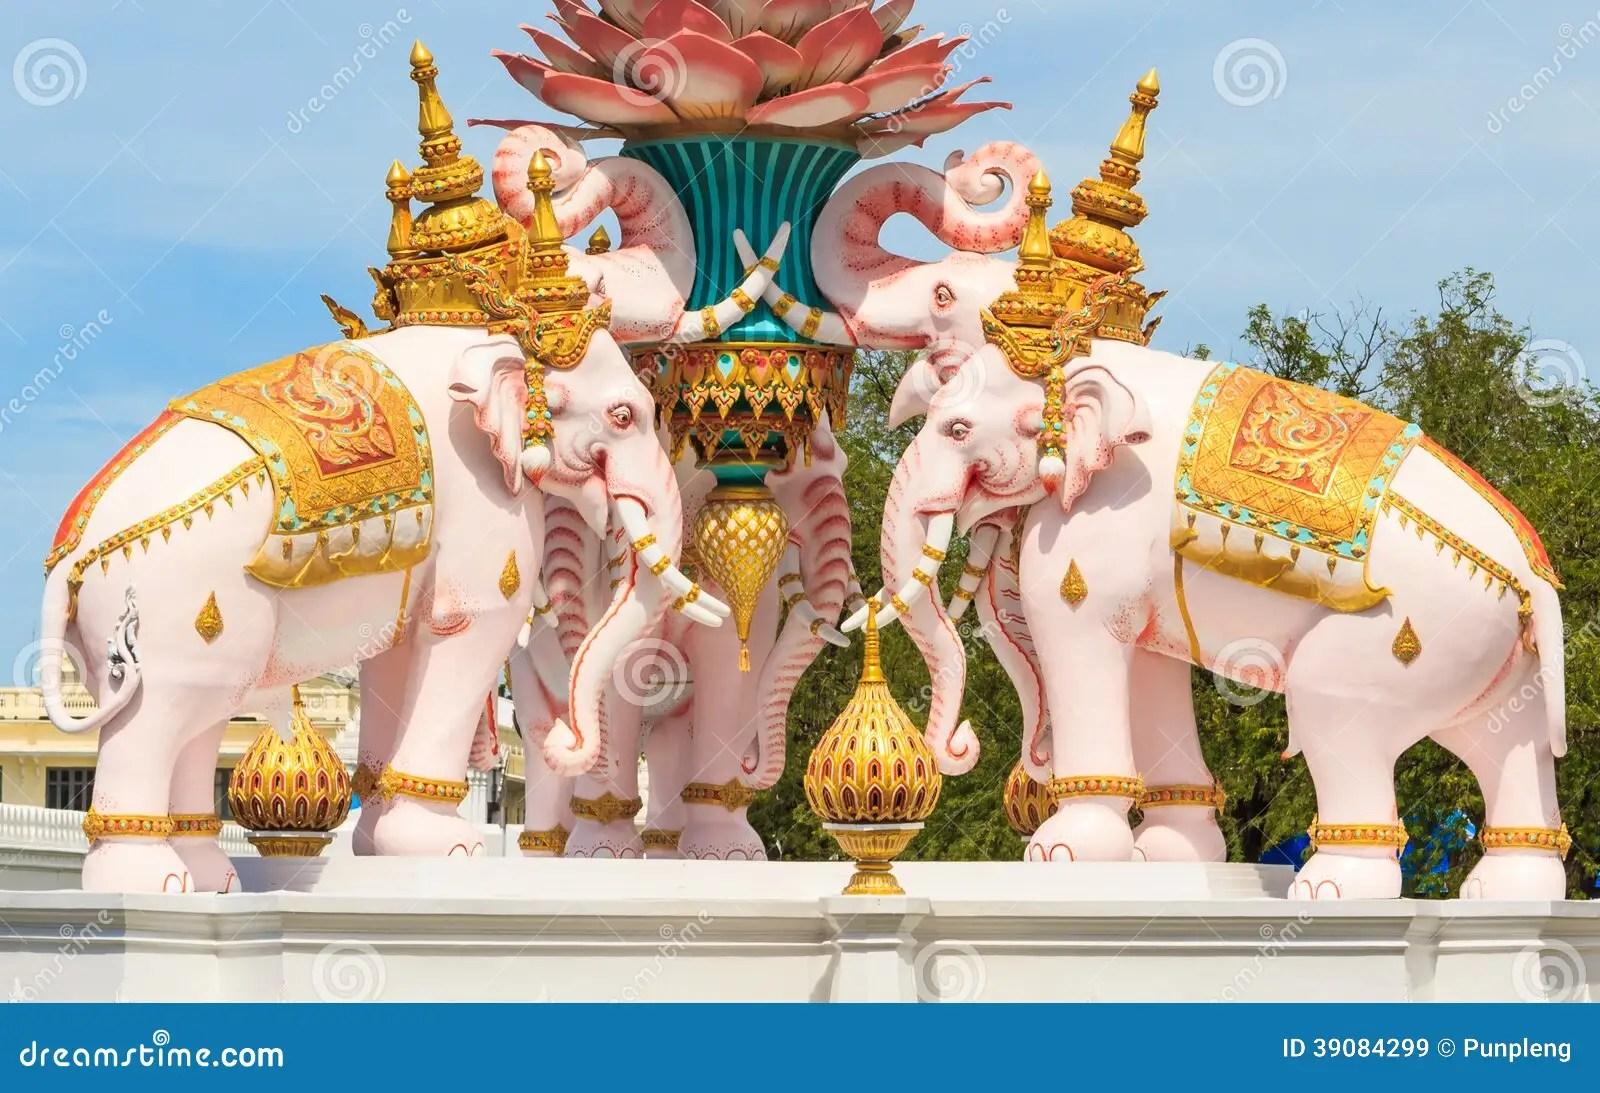 25 435 White Elephant Photos Free Royalty Free Stock Photos From Dreamstime